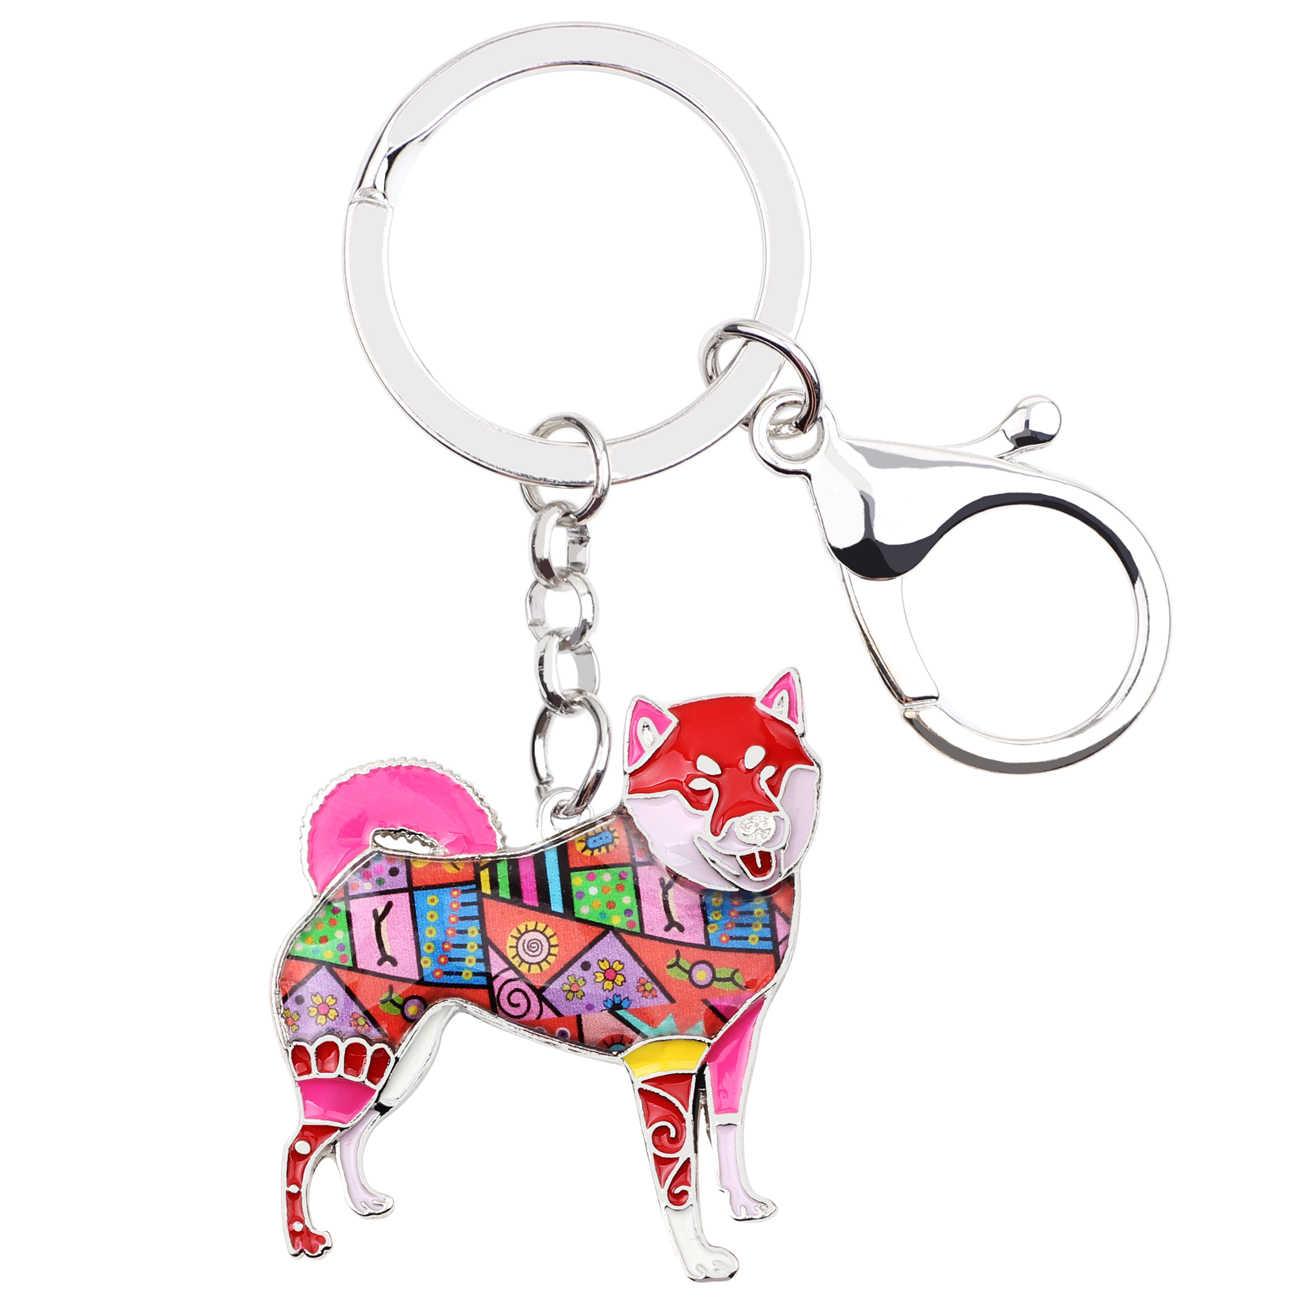 Bonsny Metal Shiba Inu Key Chain Key Ring Bag Charm Enamel Dog Keychain Accessories Souvenir Fashion Animal Jewelry For Women